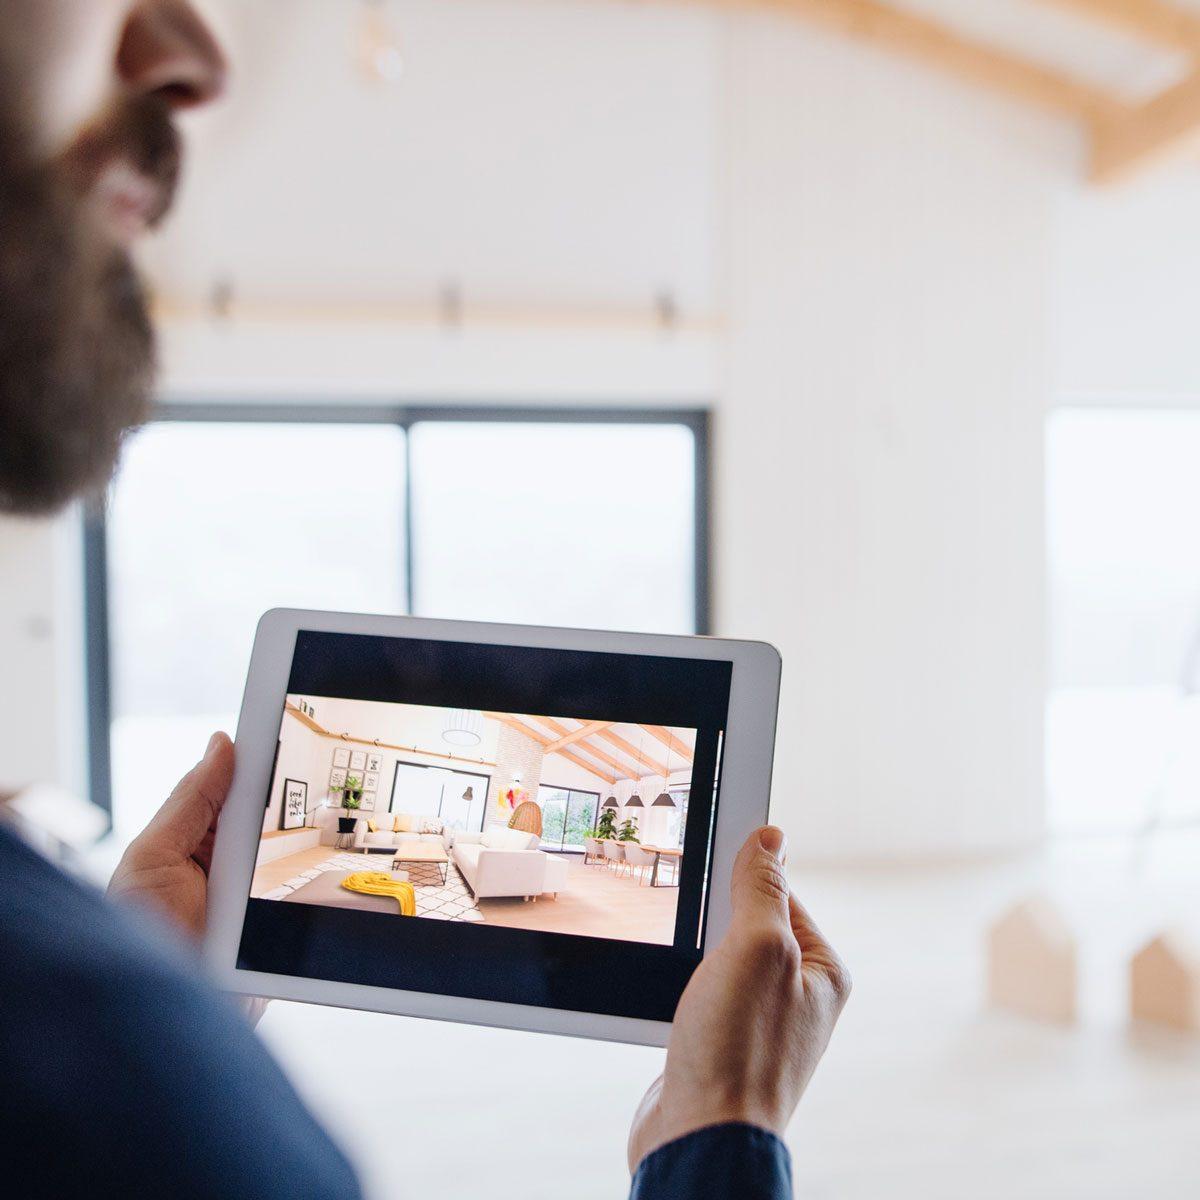 Digital rendering of interior design layout